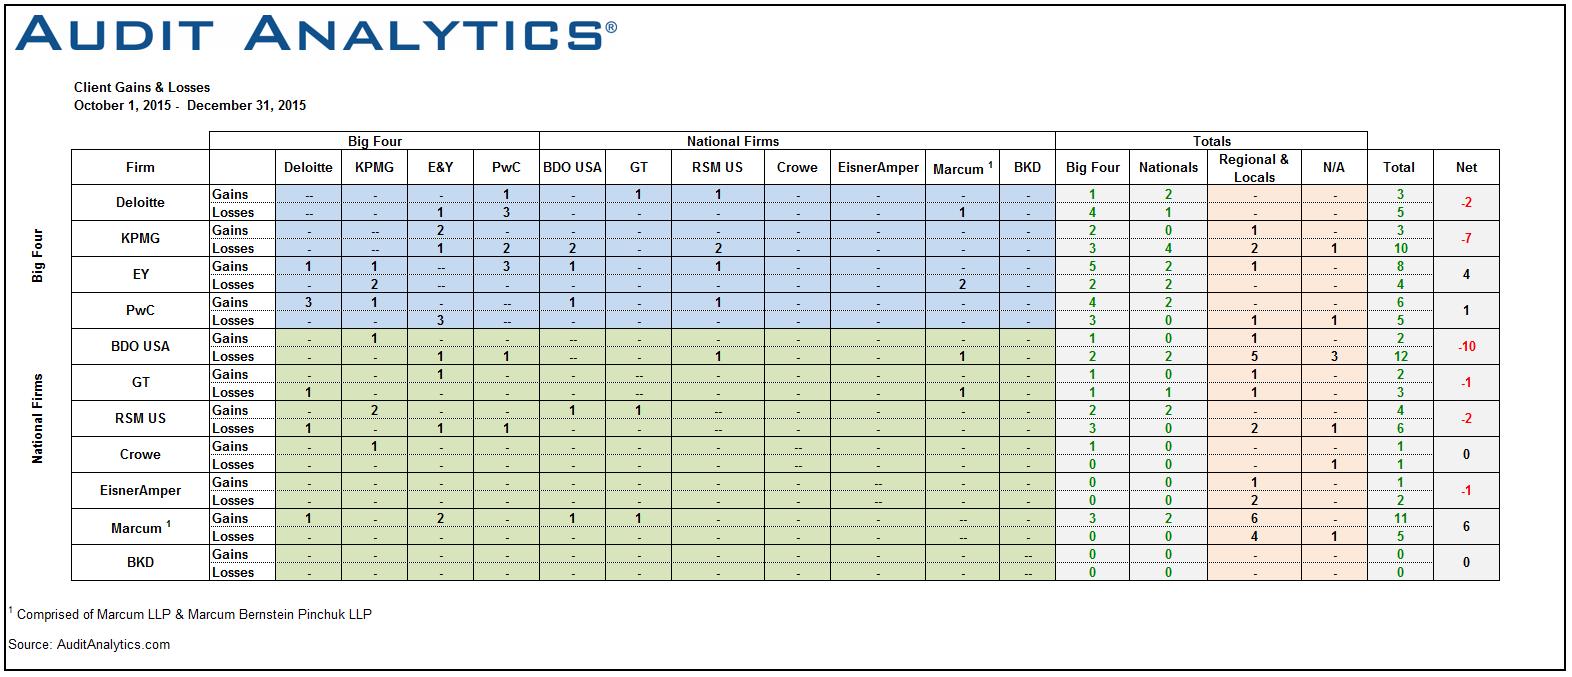 Q4 2015 Auditor Changes Matrix